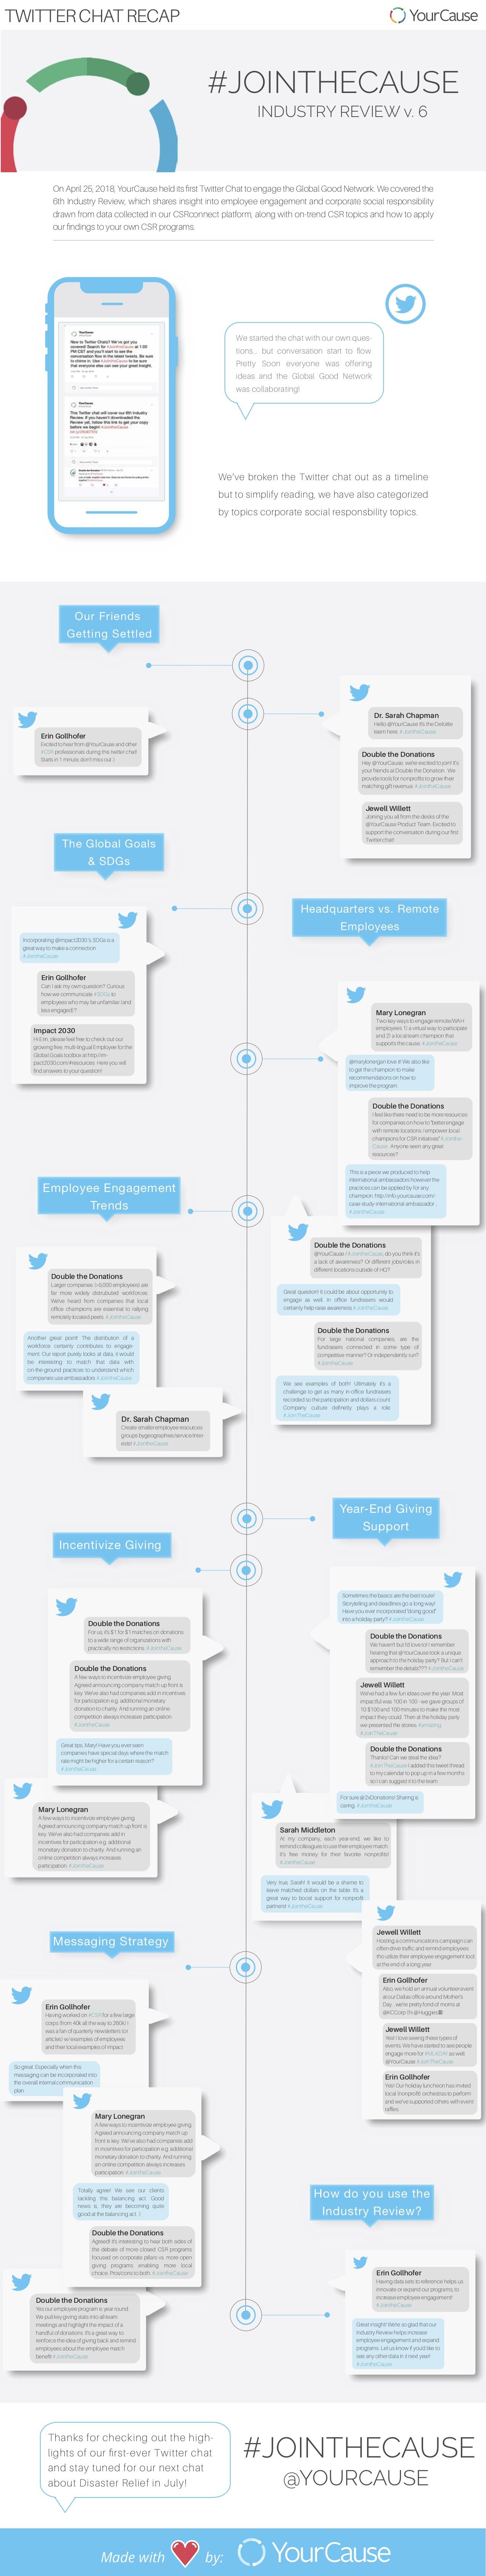 IR6 Twitter Chat copy